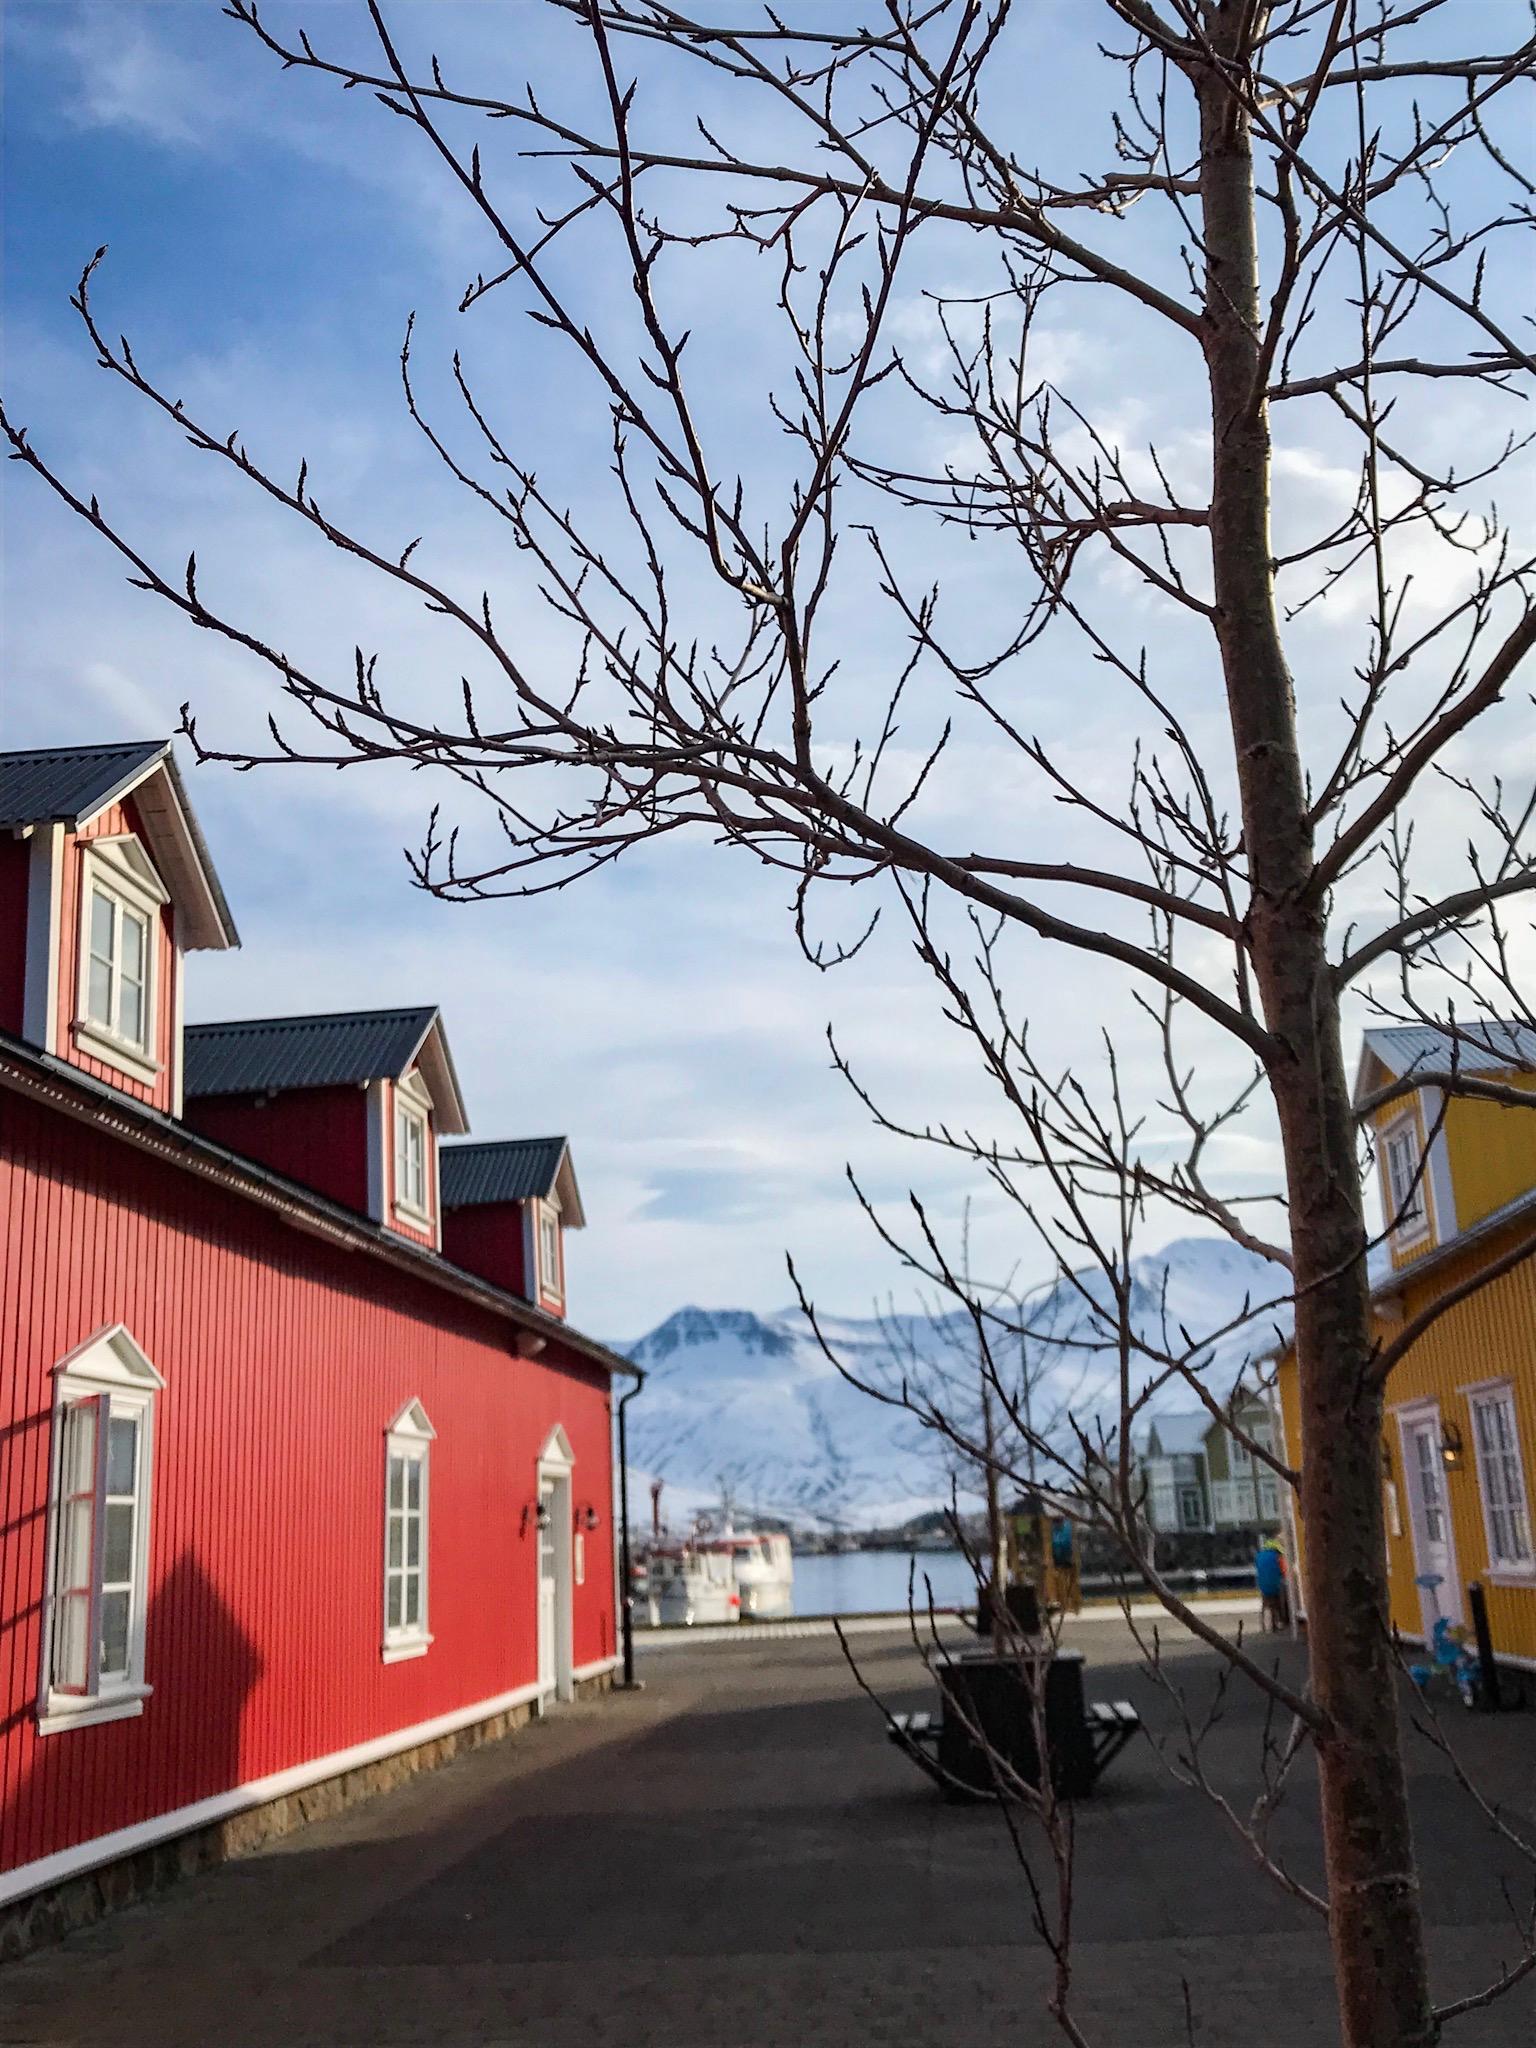 Islande On n est pas que des collants IMG_1453 voyage ski de rando peninsule des trolls blog brasserie seagull 67 siglufjordhur